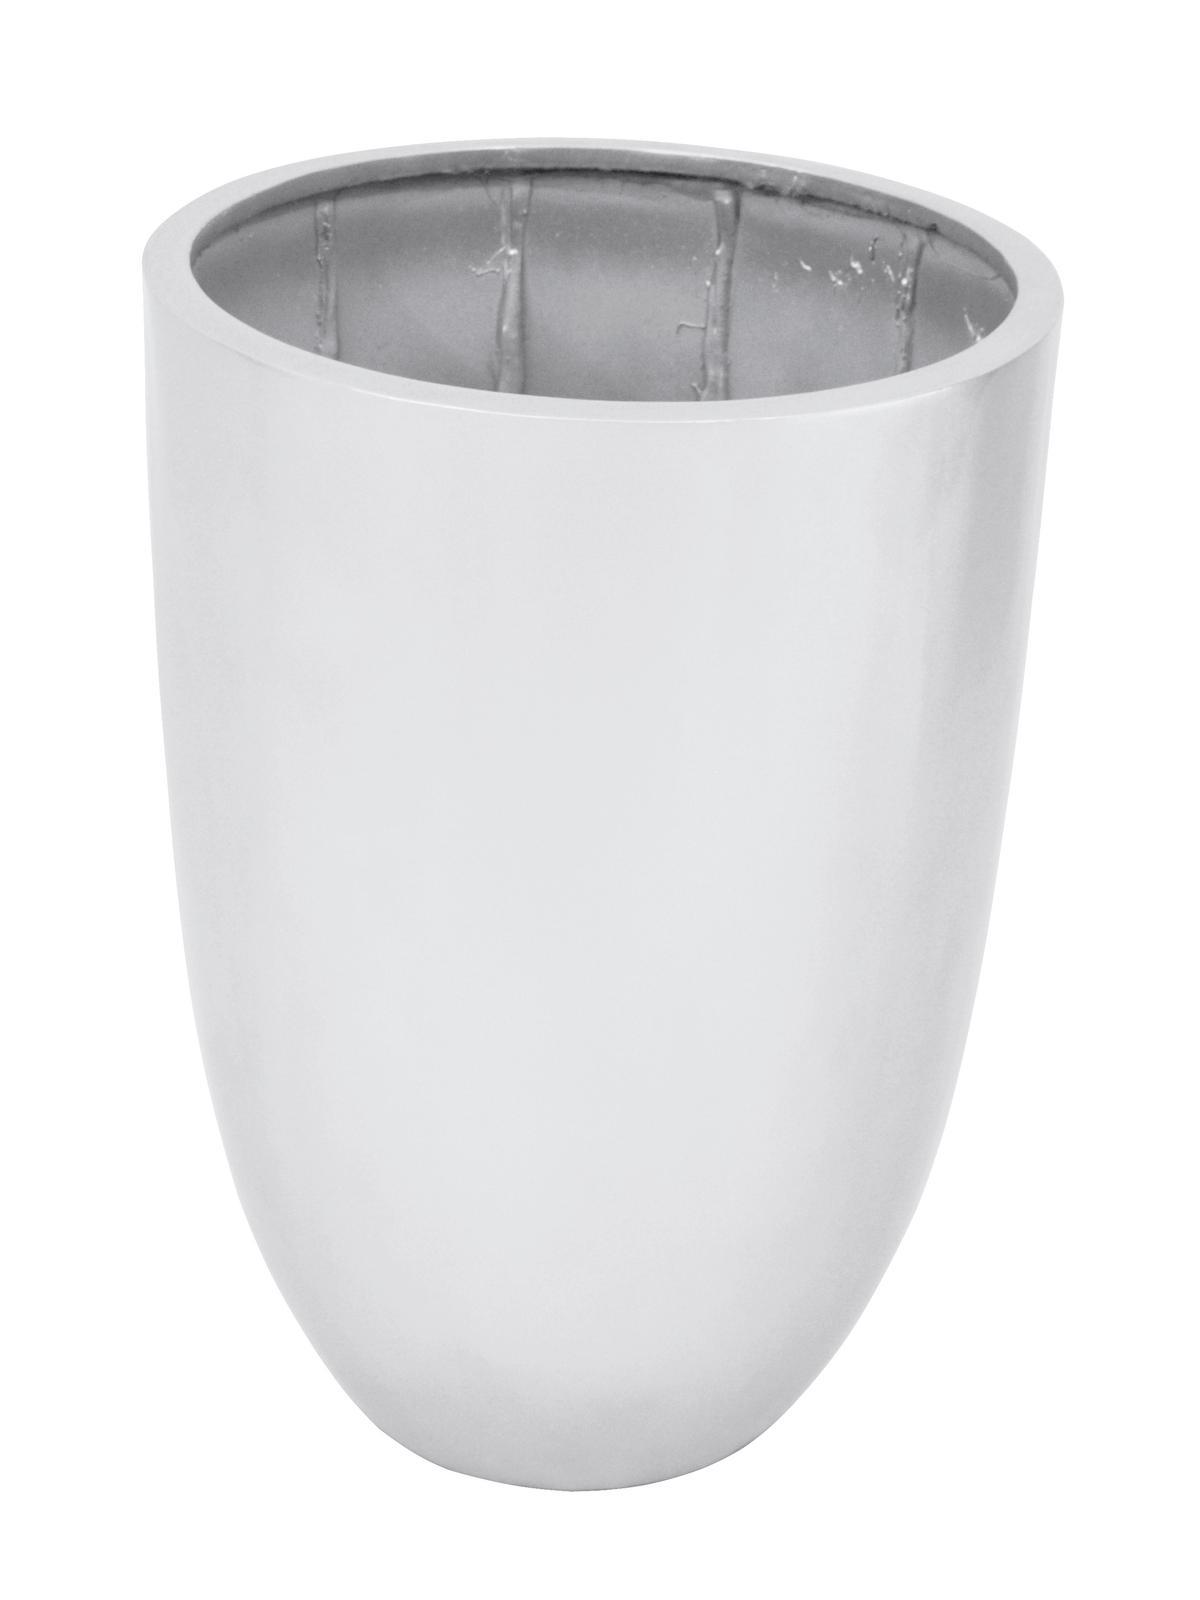 EUROPALMS LEICHTSIN CUP-69, lucido-argento